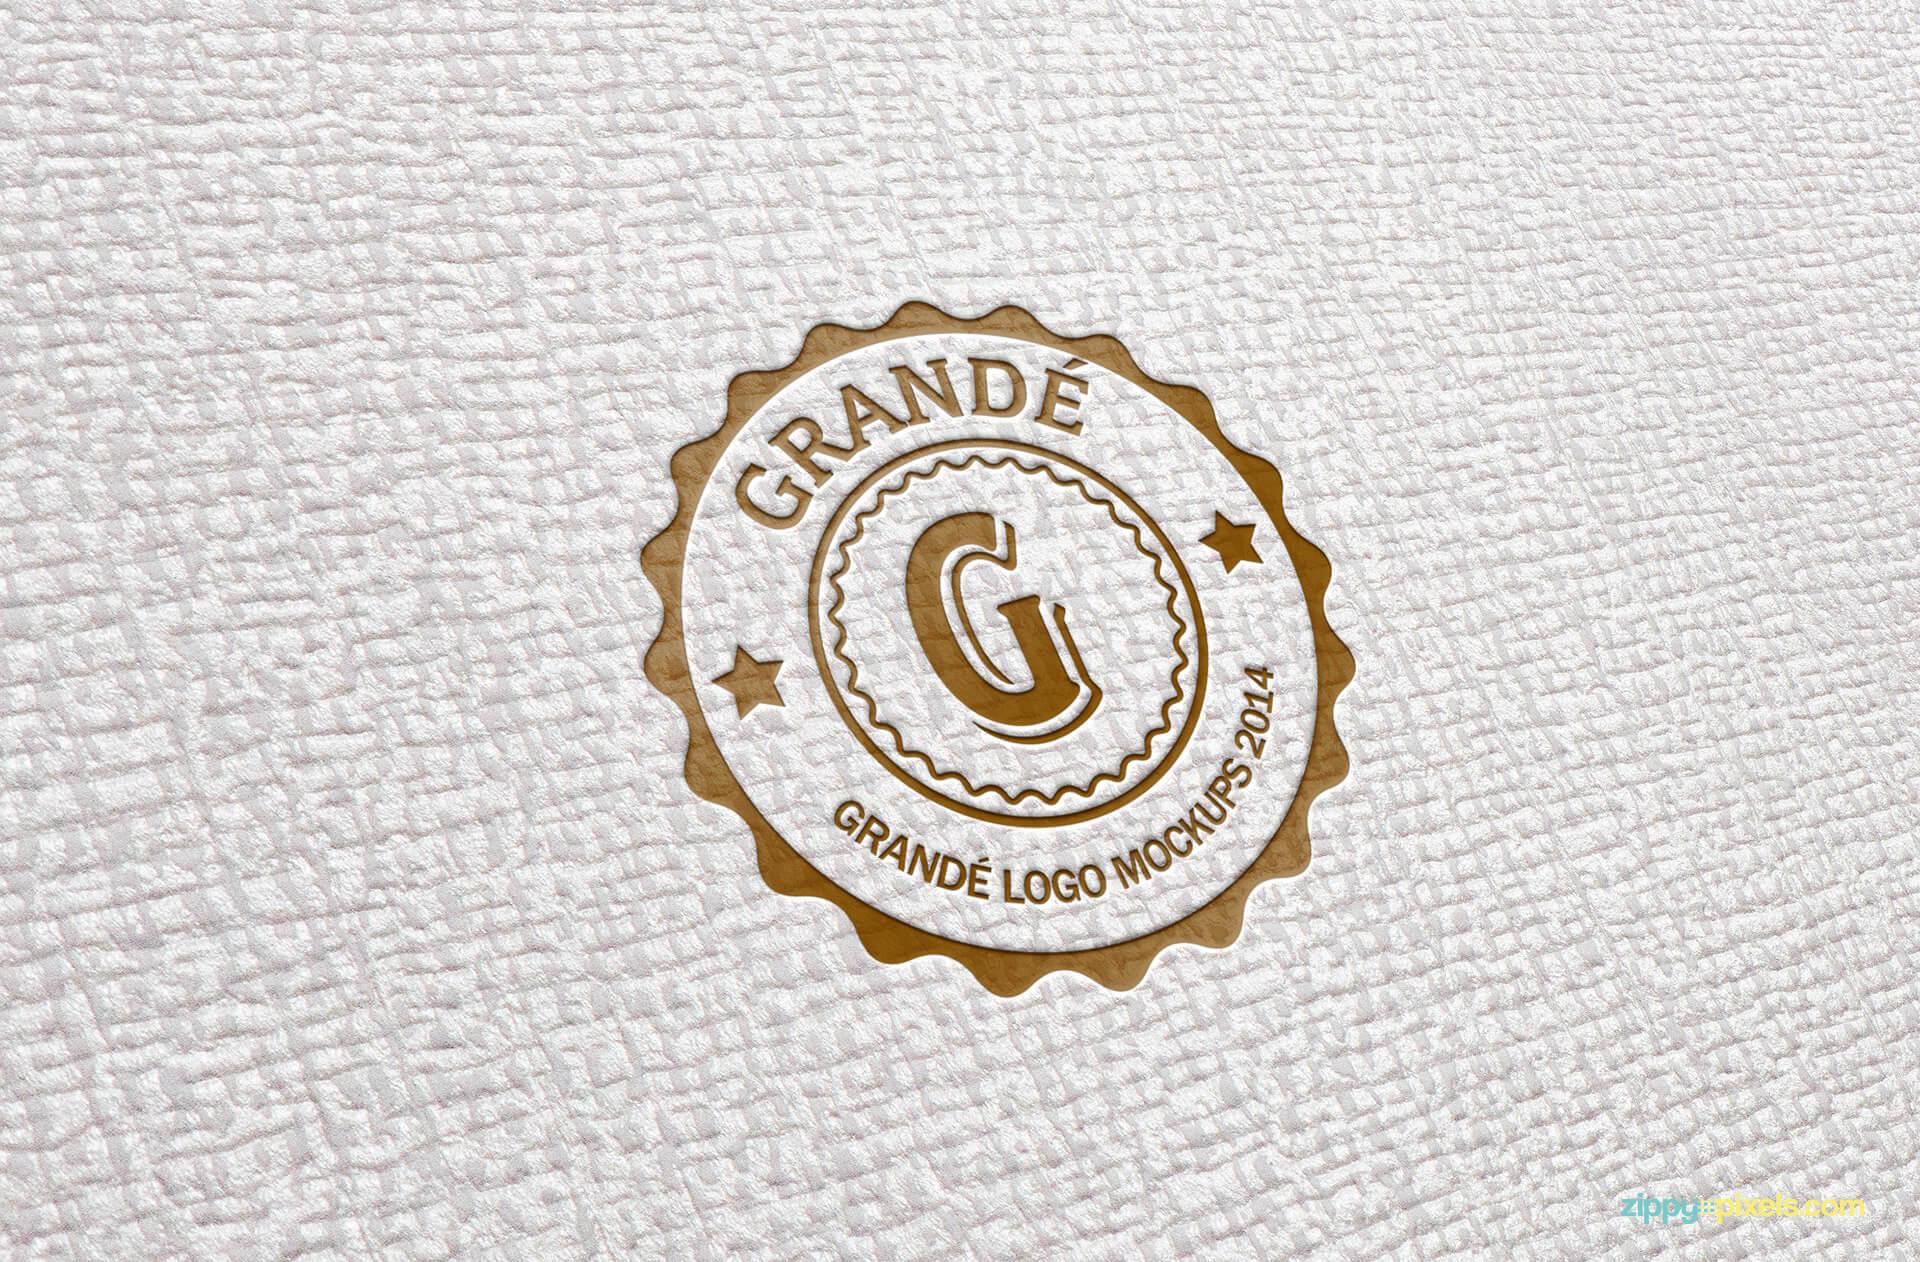 PSD Mockup of Letterpressed Logo on Textured Paper